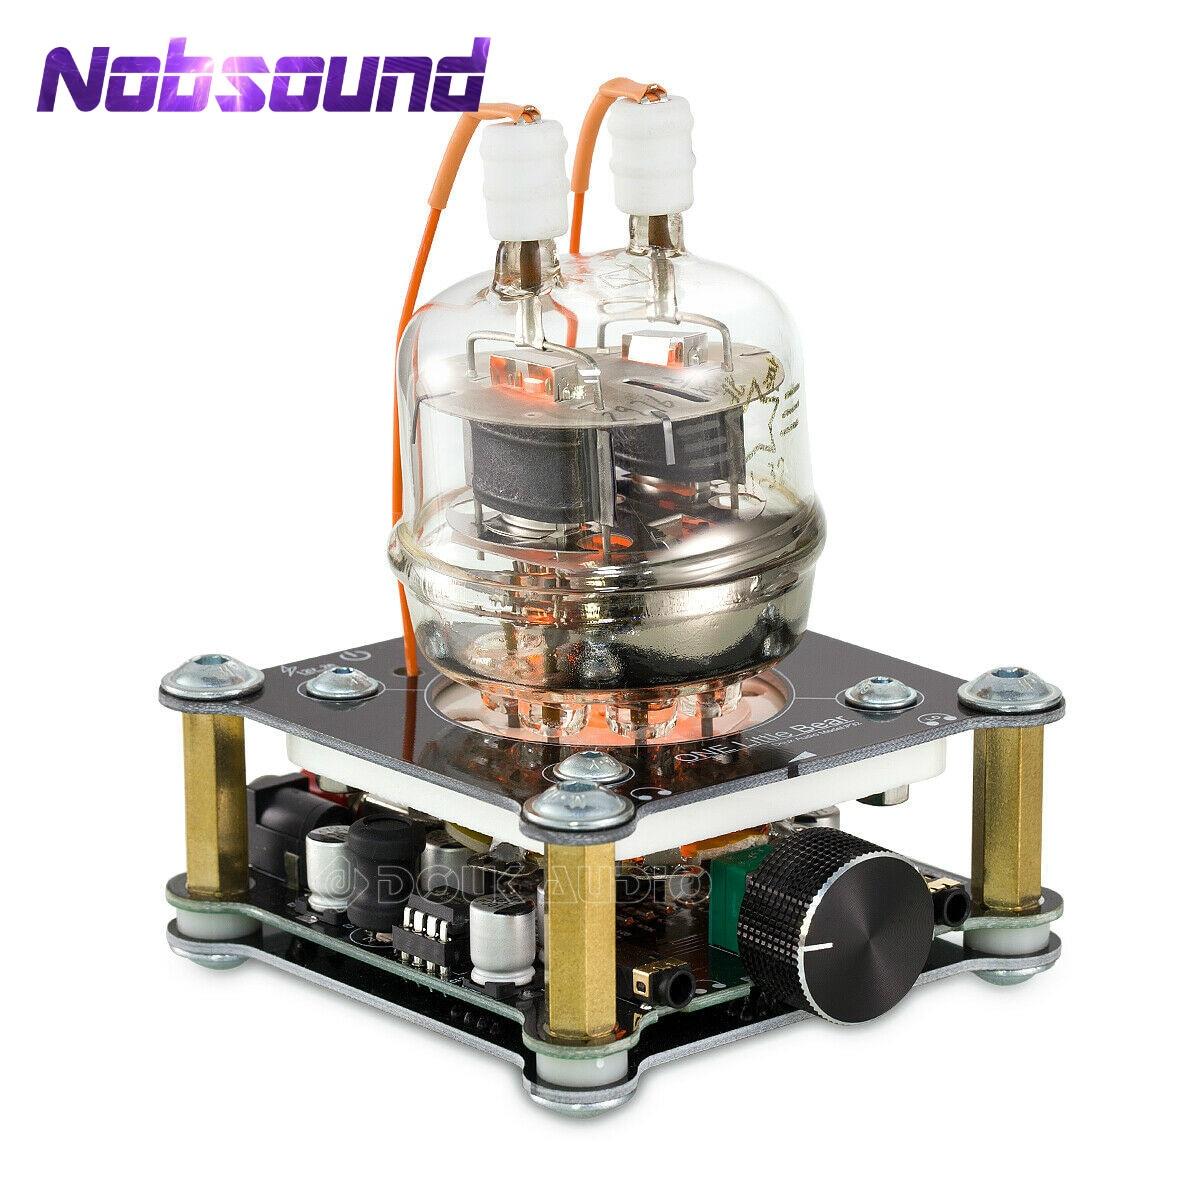 Nobsound Mini FU32 832A Valve Tube Amplifier Hi Fi Stereo Preamp Desktop Tube Headphone Amp